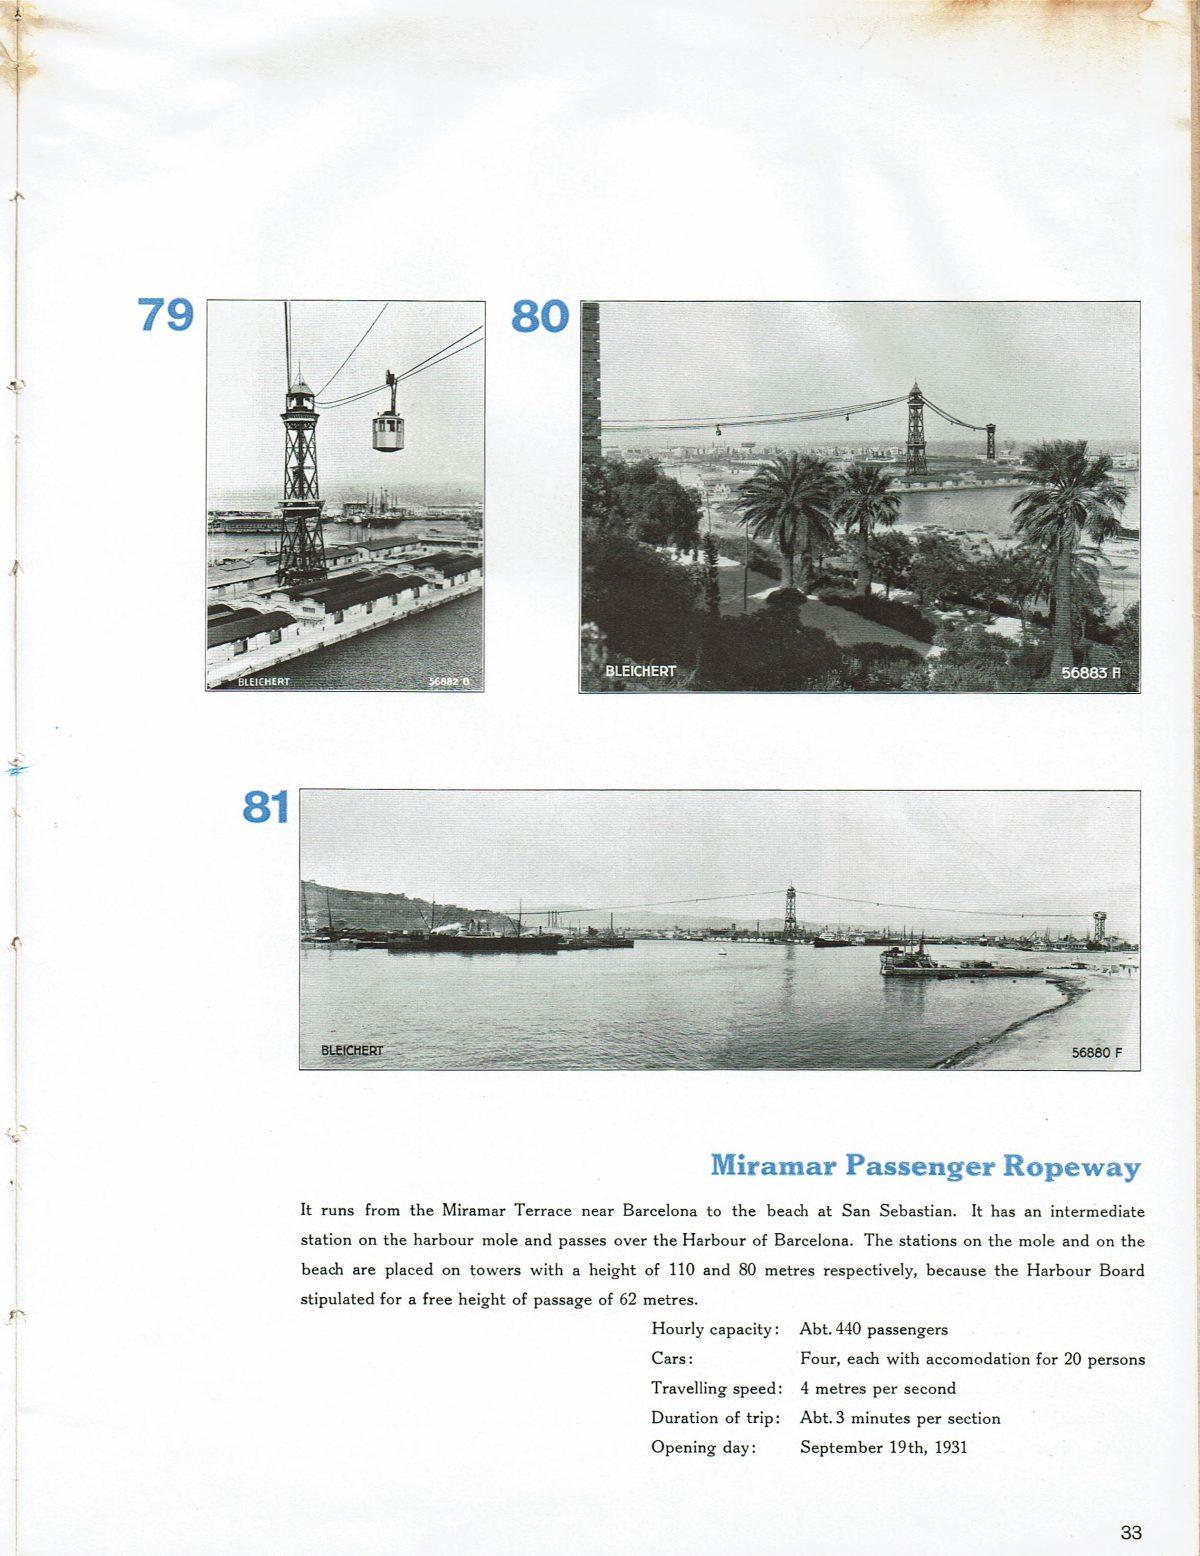 20_Bleichert Mirarmar Barcelona (SPA) (79-80-81)